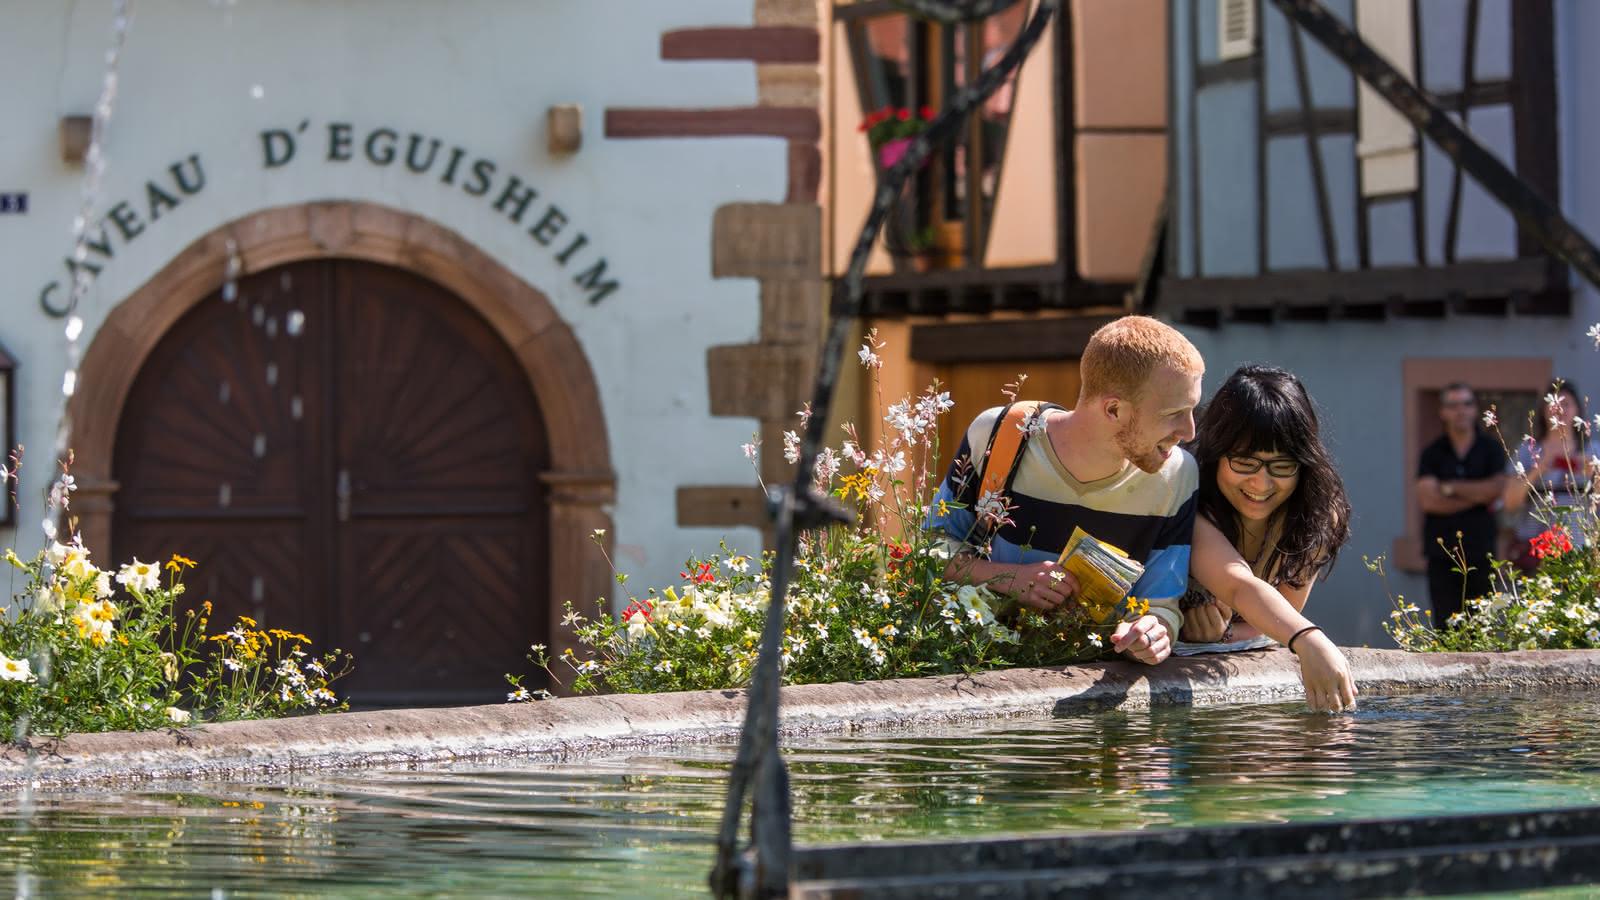 Caveau d'Eguisheim - Fontaine